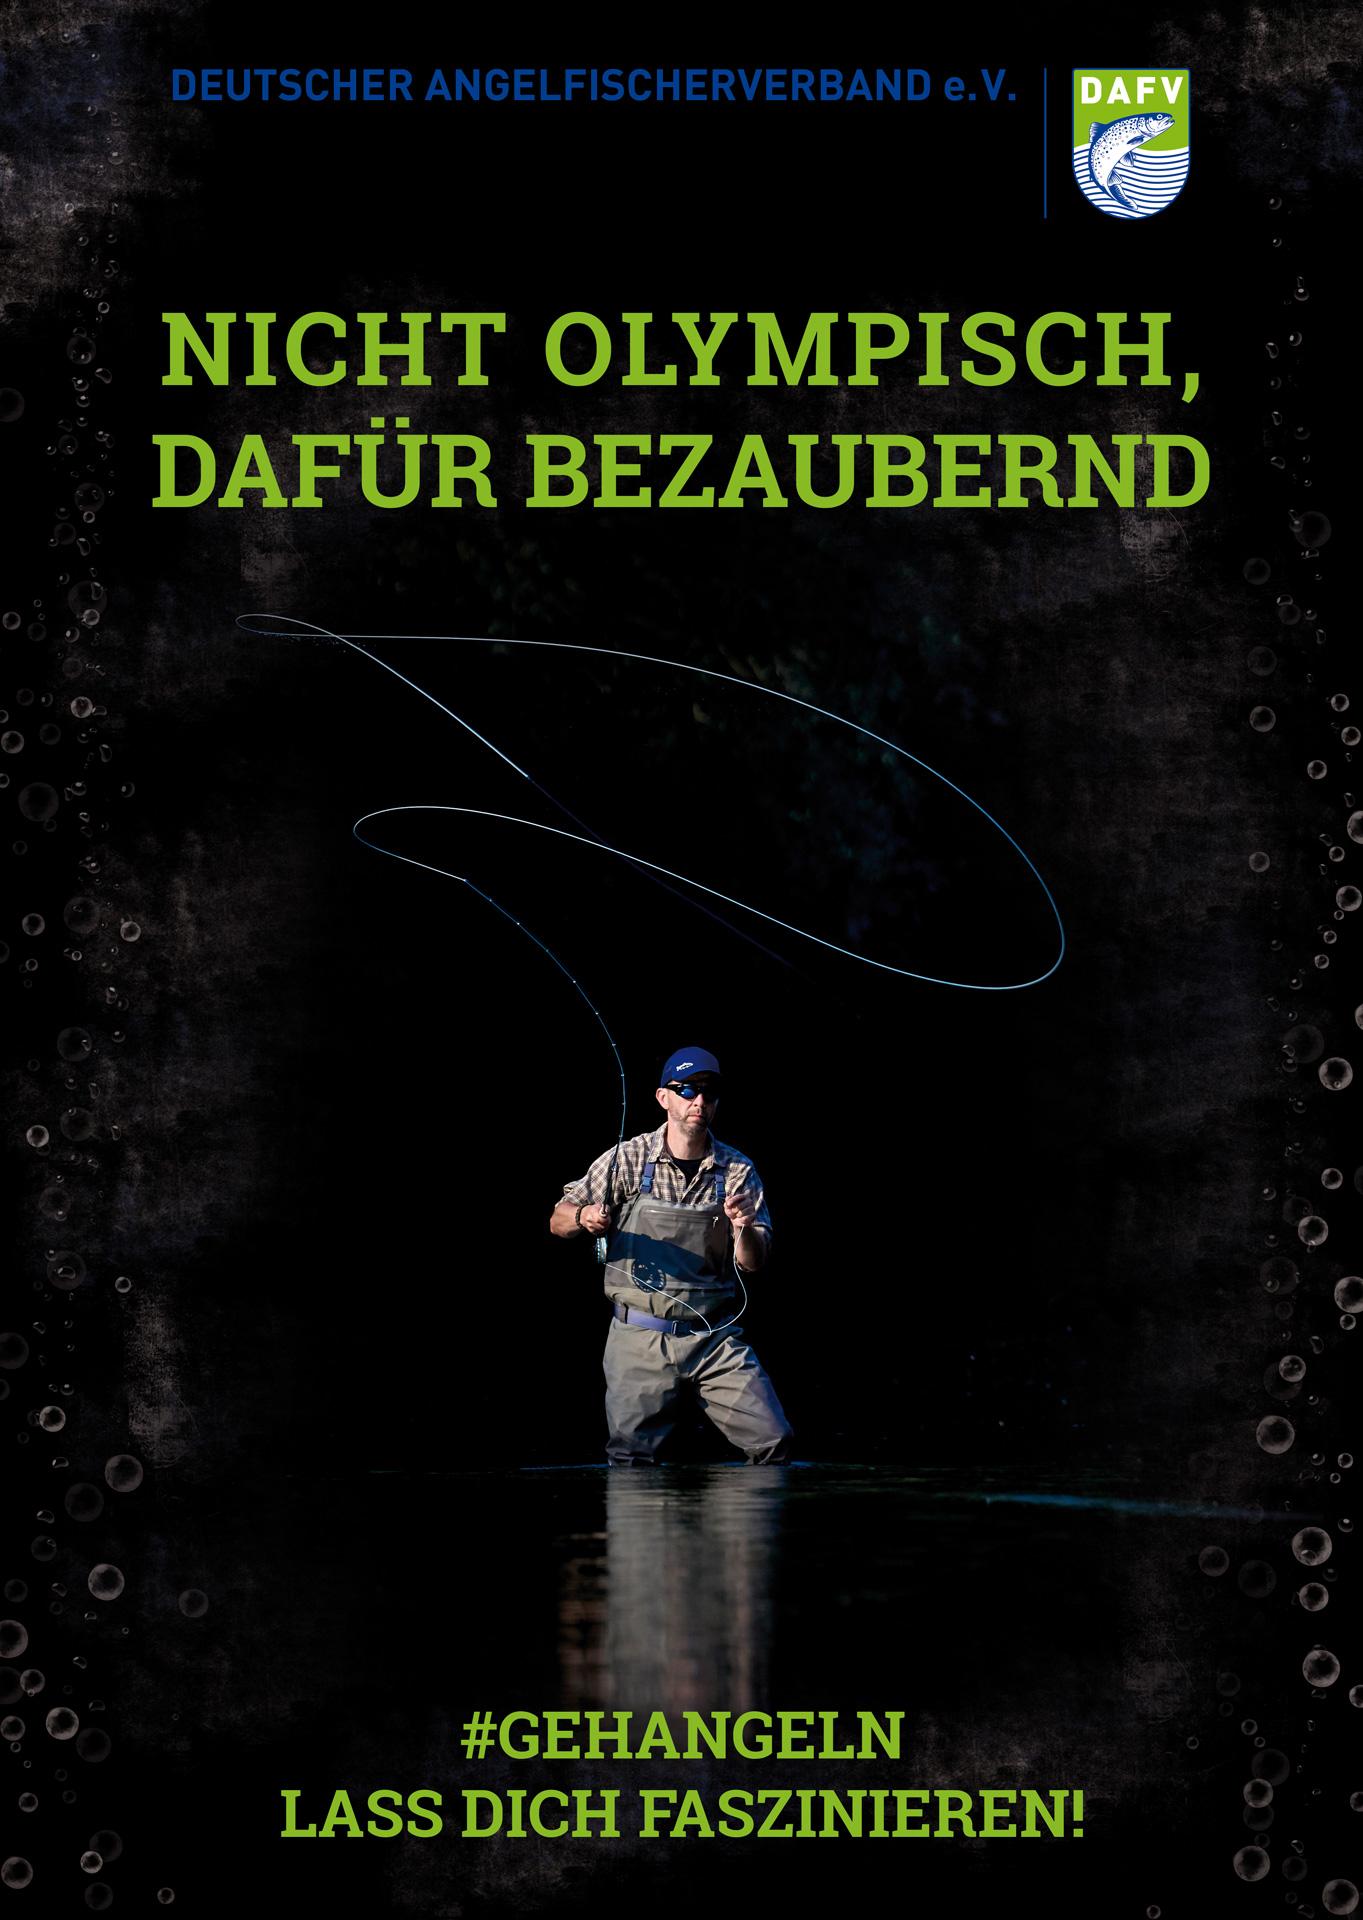 DAFV_Kampagne_olympisch